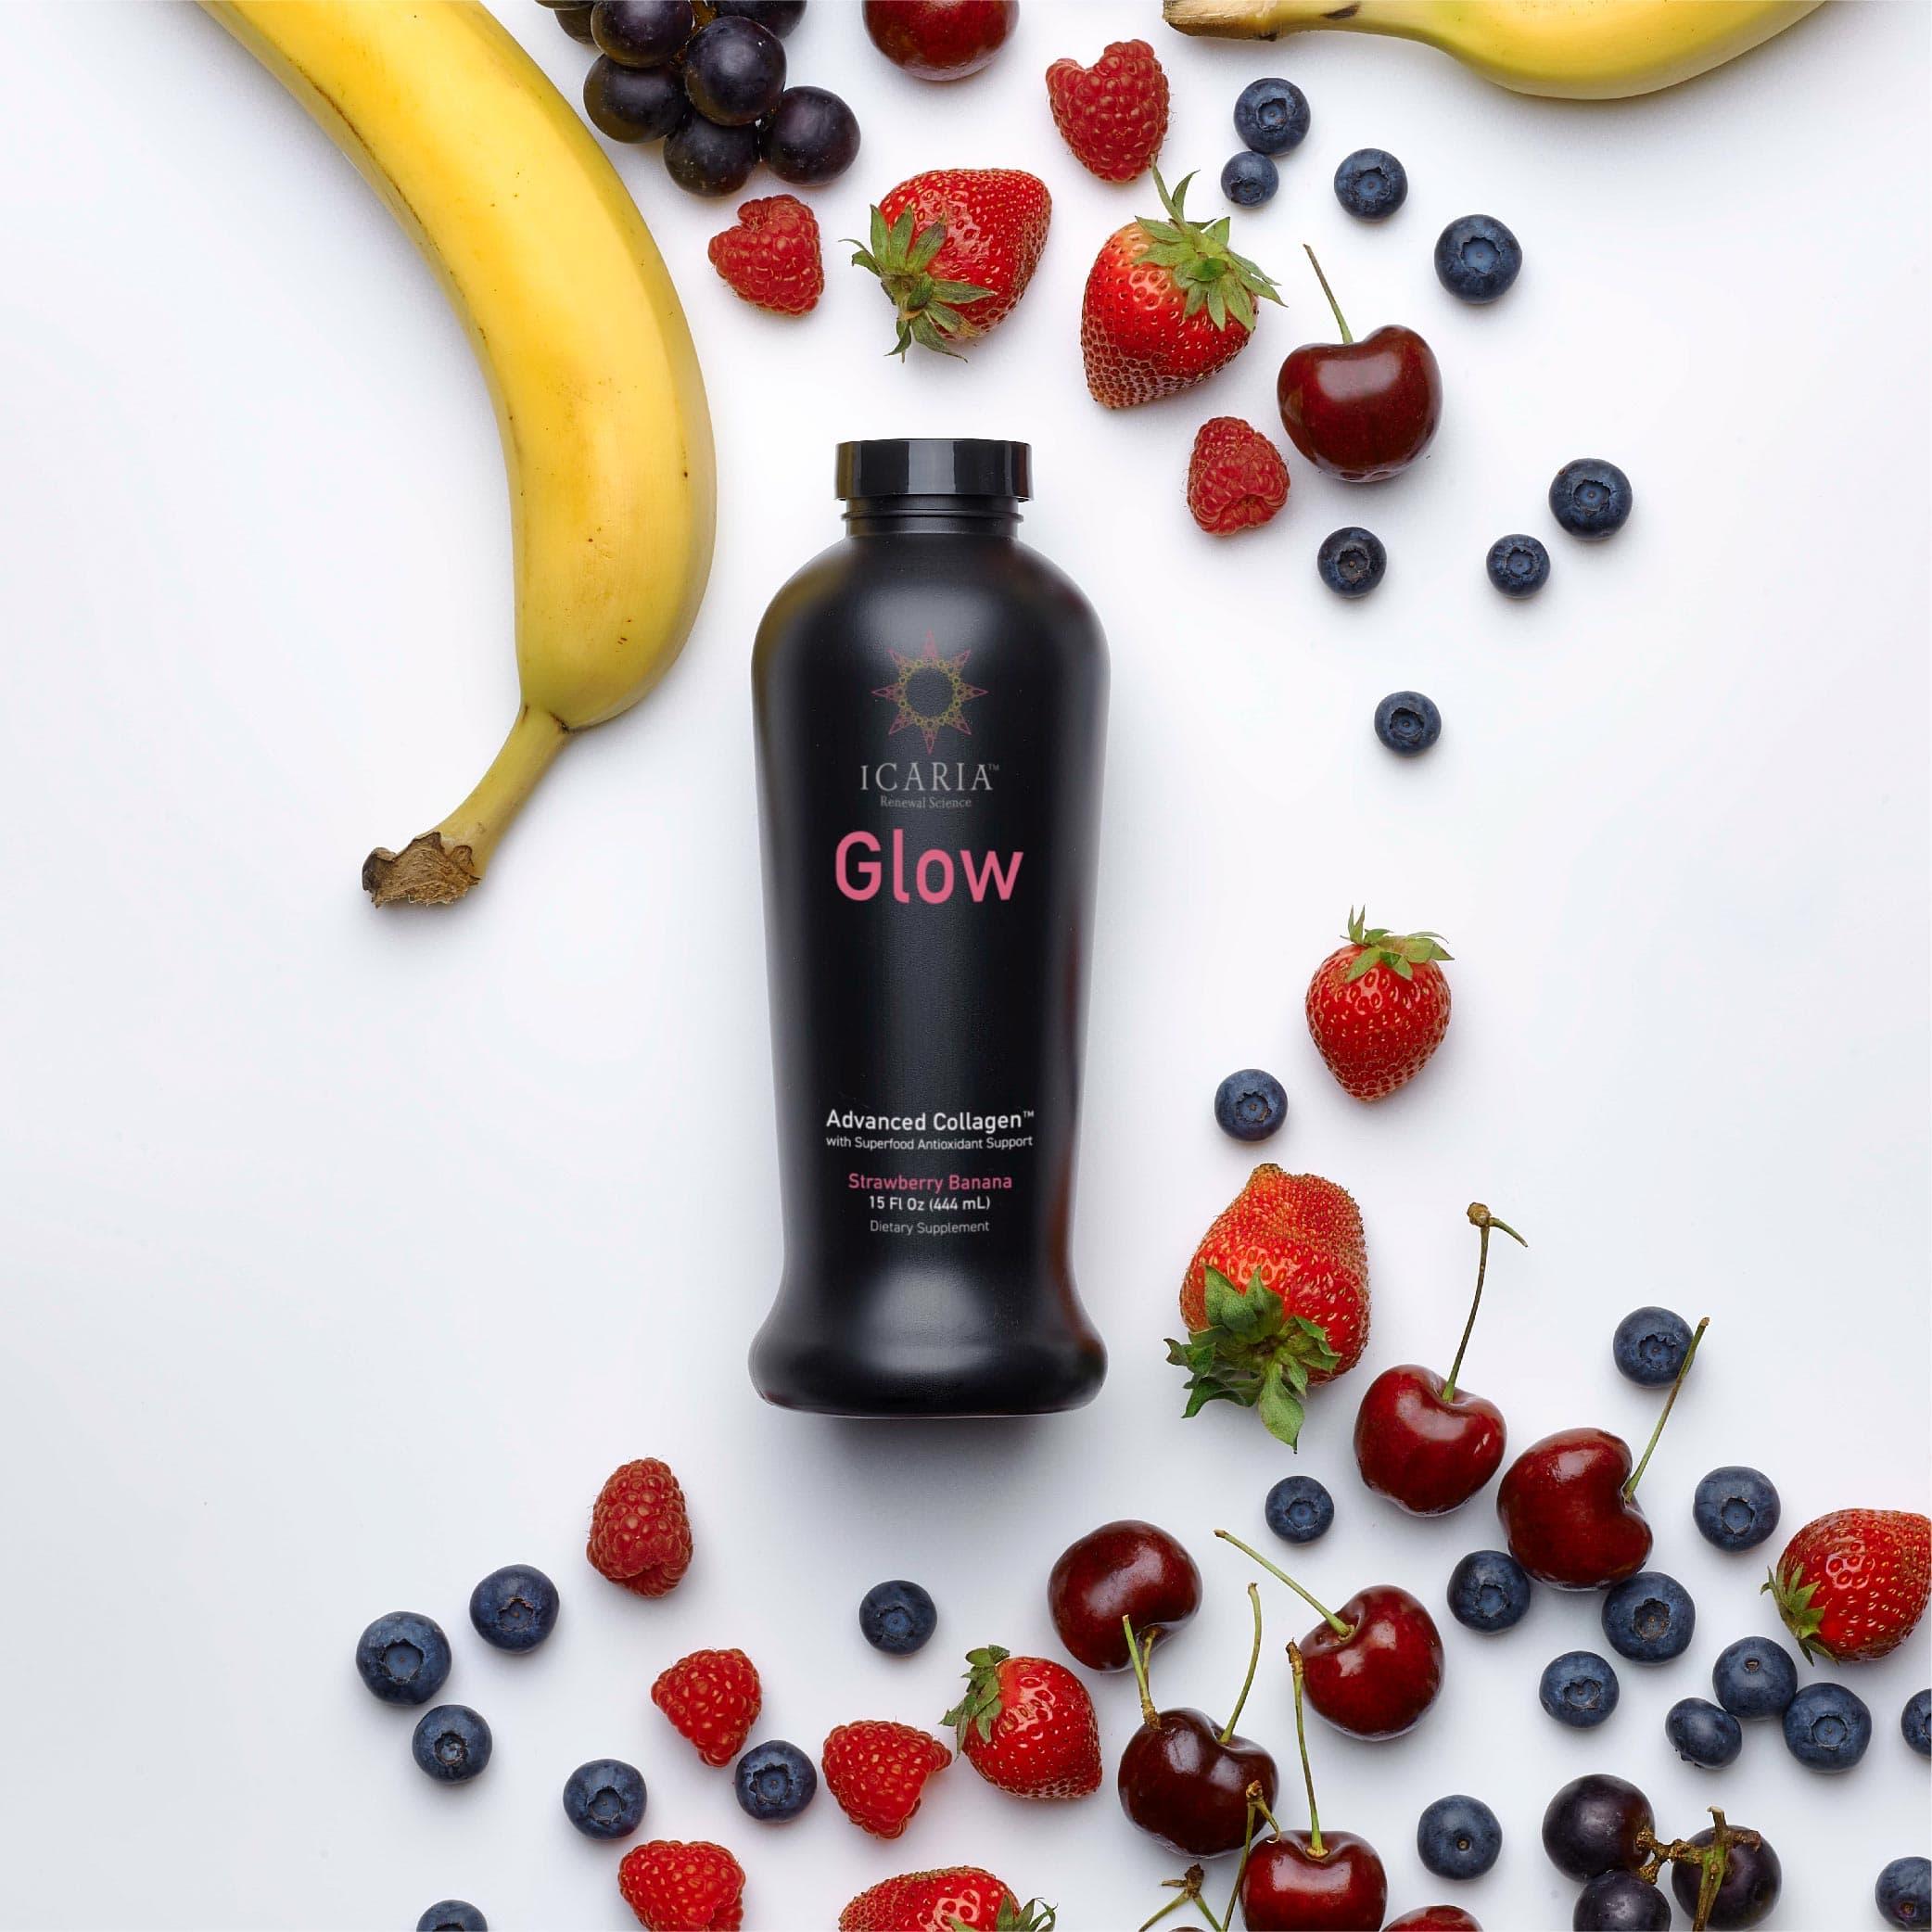 ICARIA Glow - Strawberry Banana